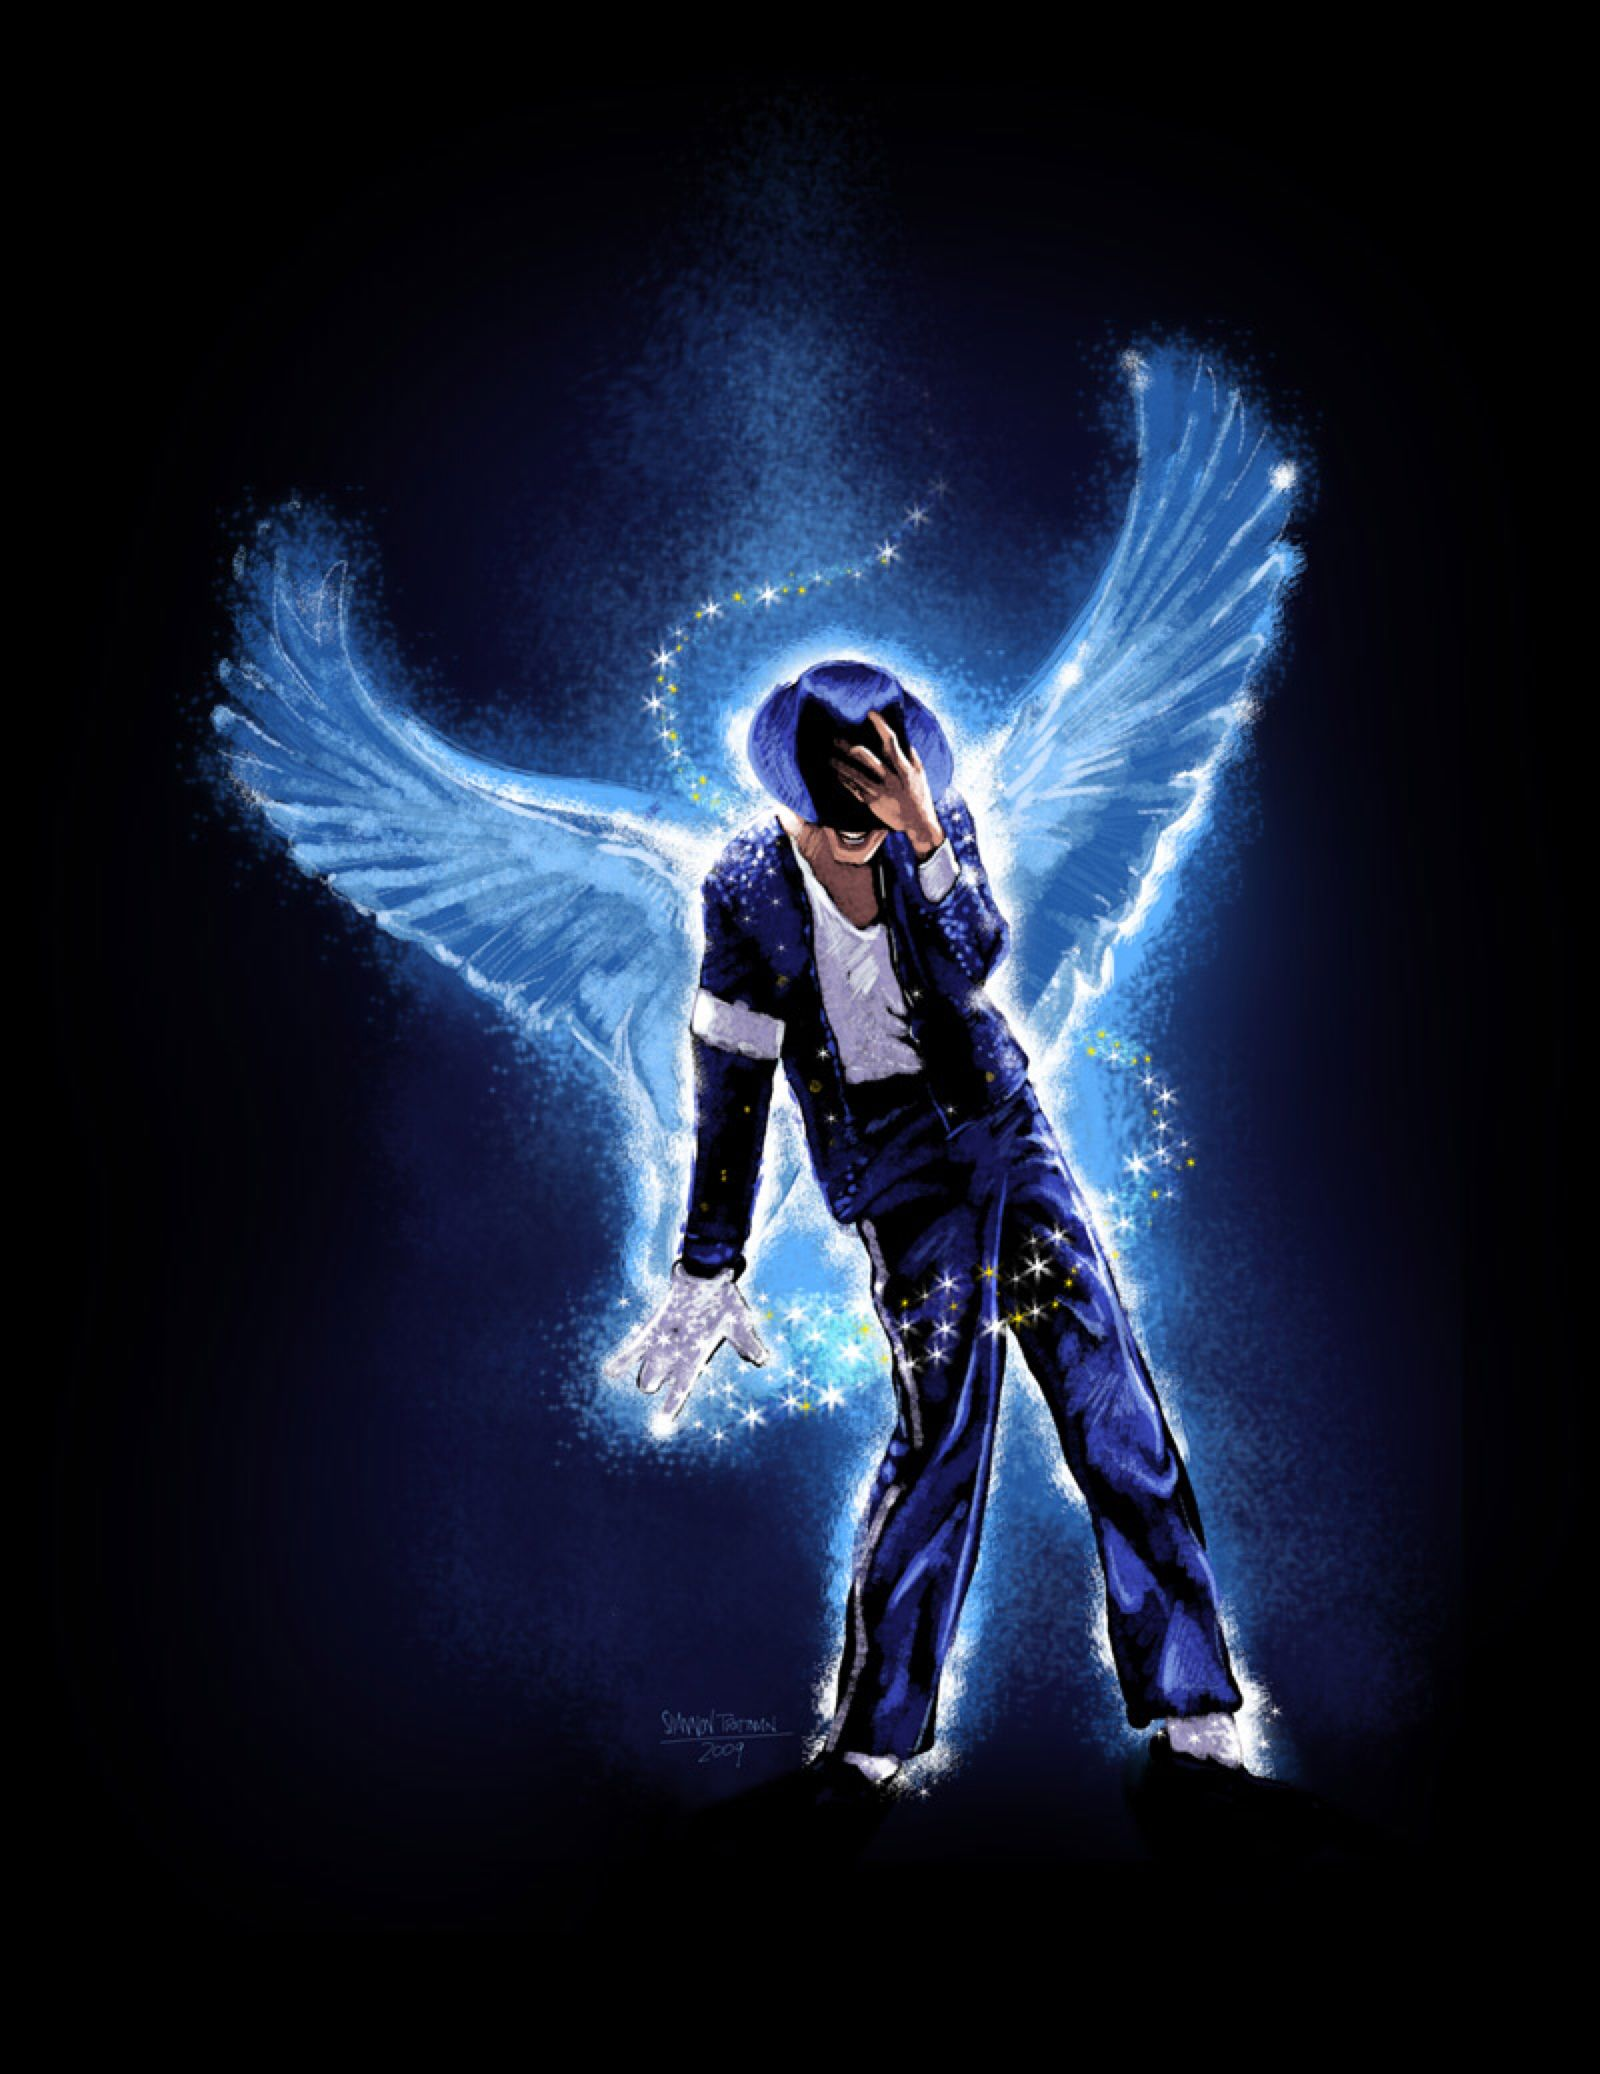 Michael Jackson Tribute By Shannontrottman On Deviantart